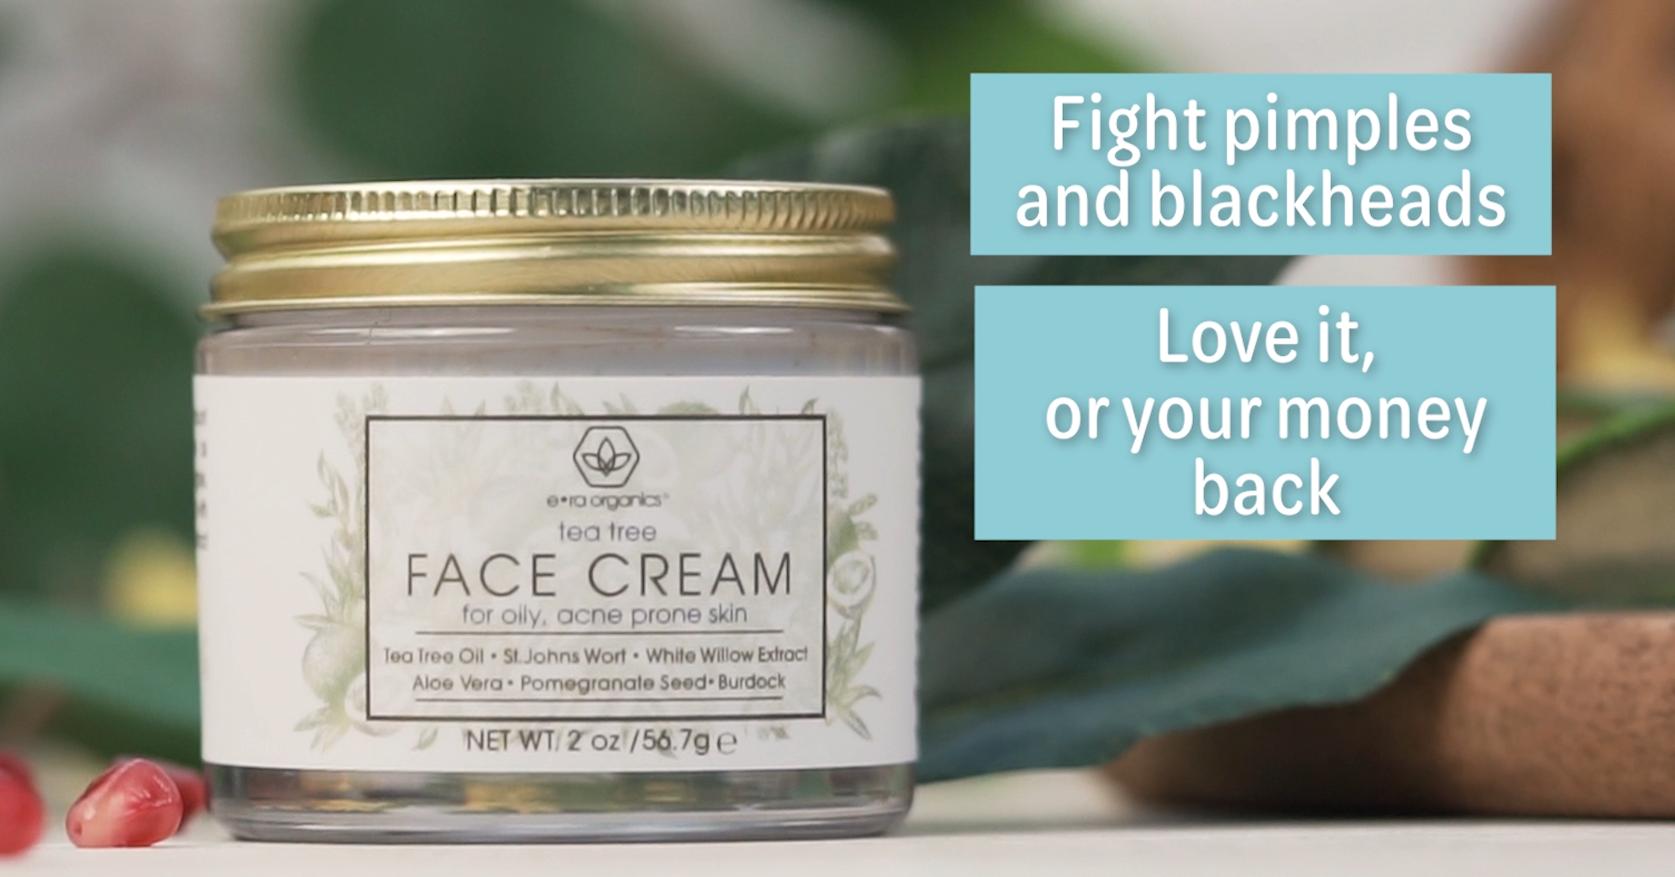 Era Organics Tea Tree Oil Face Cream - For Oily, Acne Prone Skin, Extra Soothing & Nourishing Non-Greasy Botanical… 7